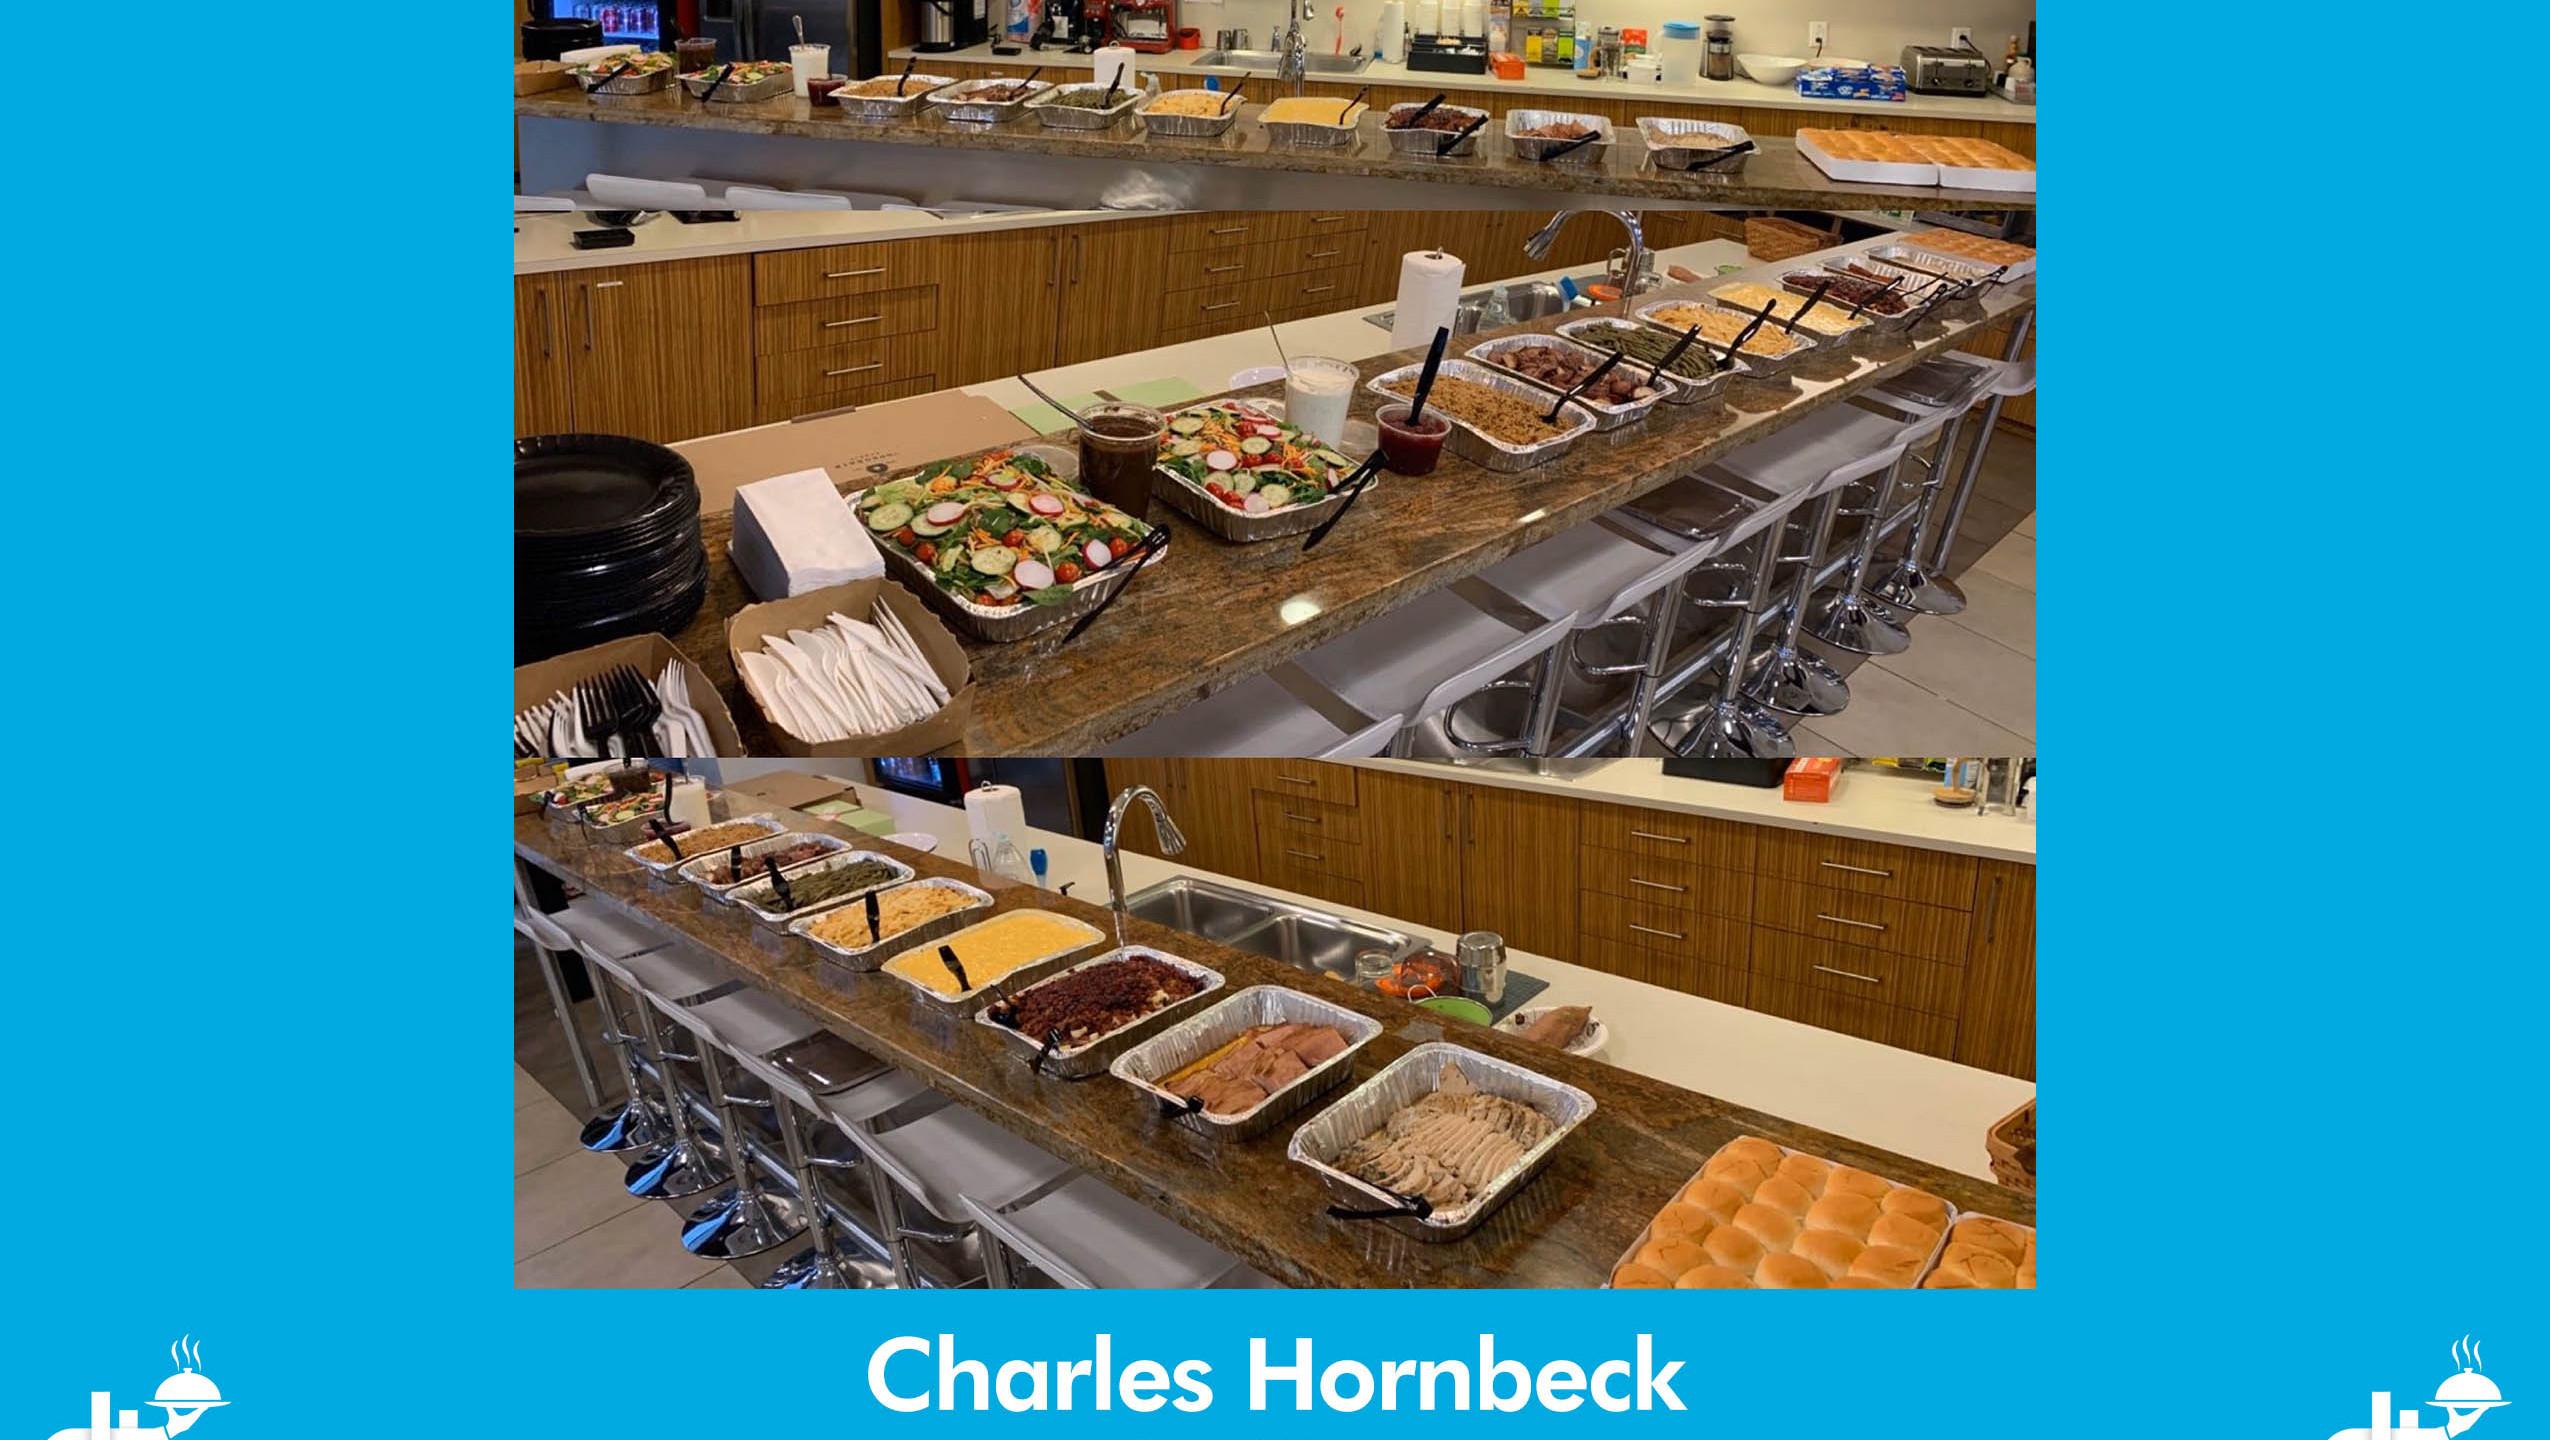 Charles Hornbeck Setup Photo